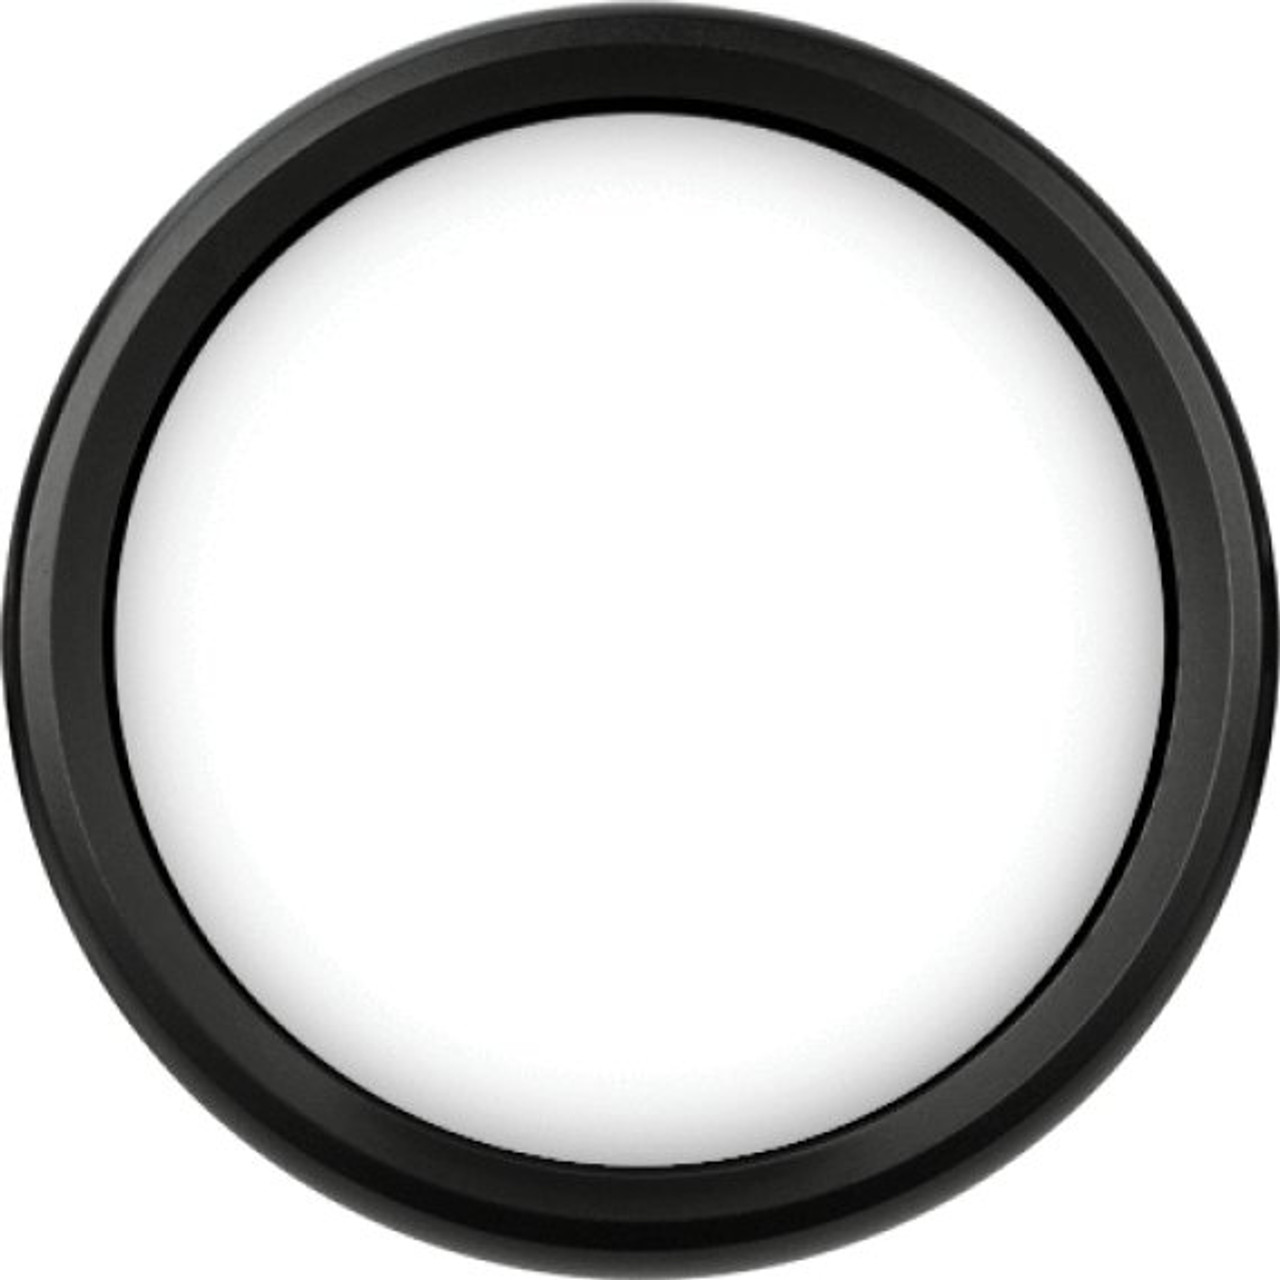 "Revolution Black Replacement Bezel for 4"" gauge"